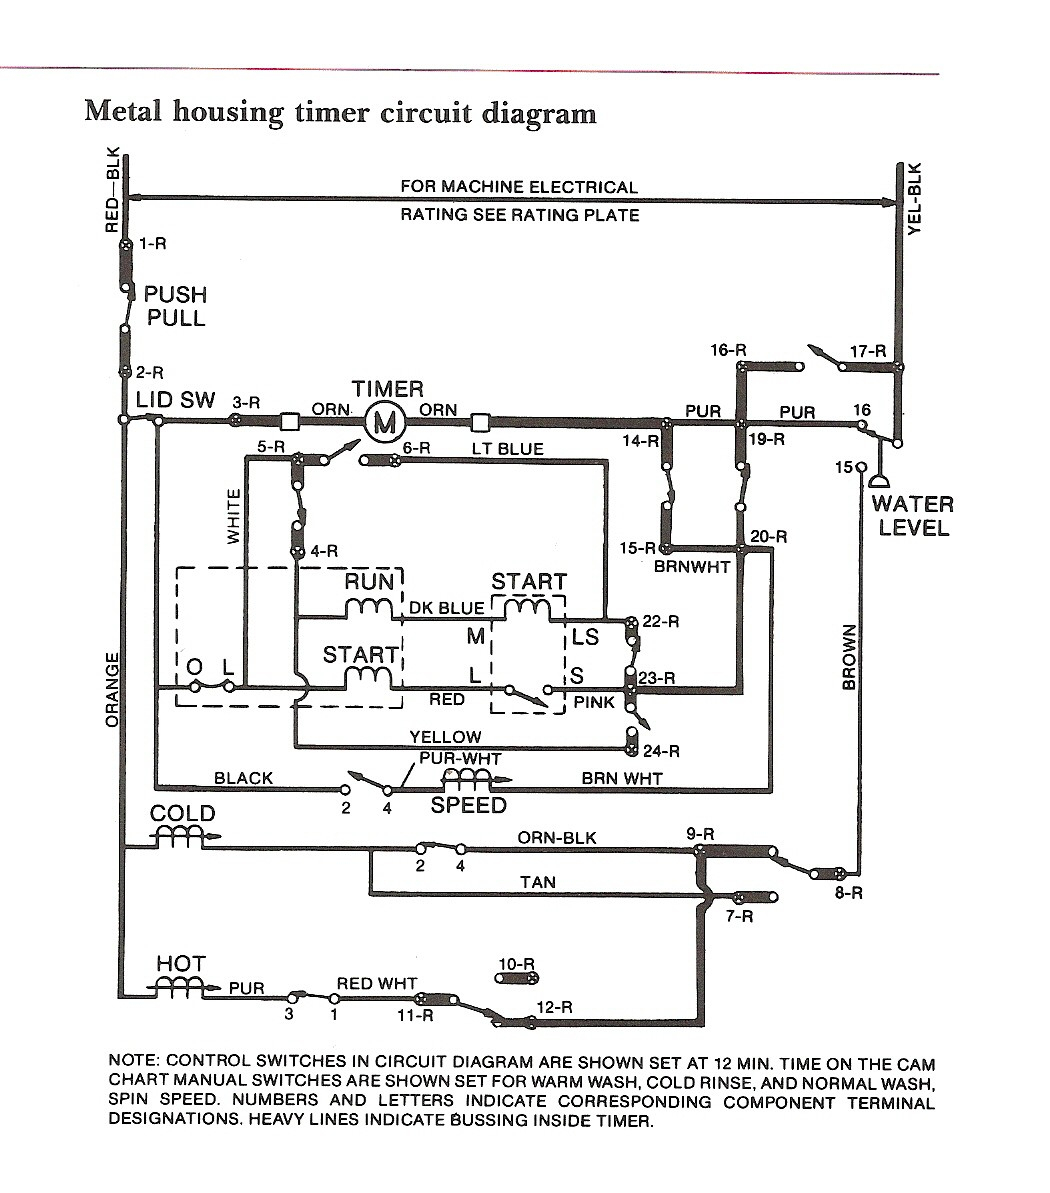 Ge Motor Wiring Diagram - Wiring Diagram Data Oreo - General Motors Wiring Diagram